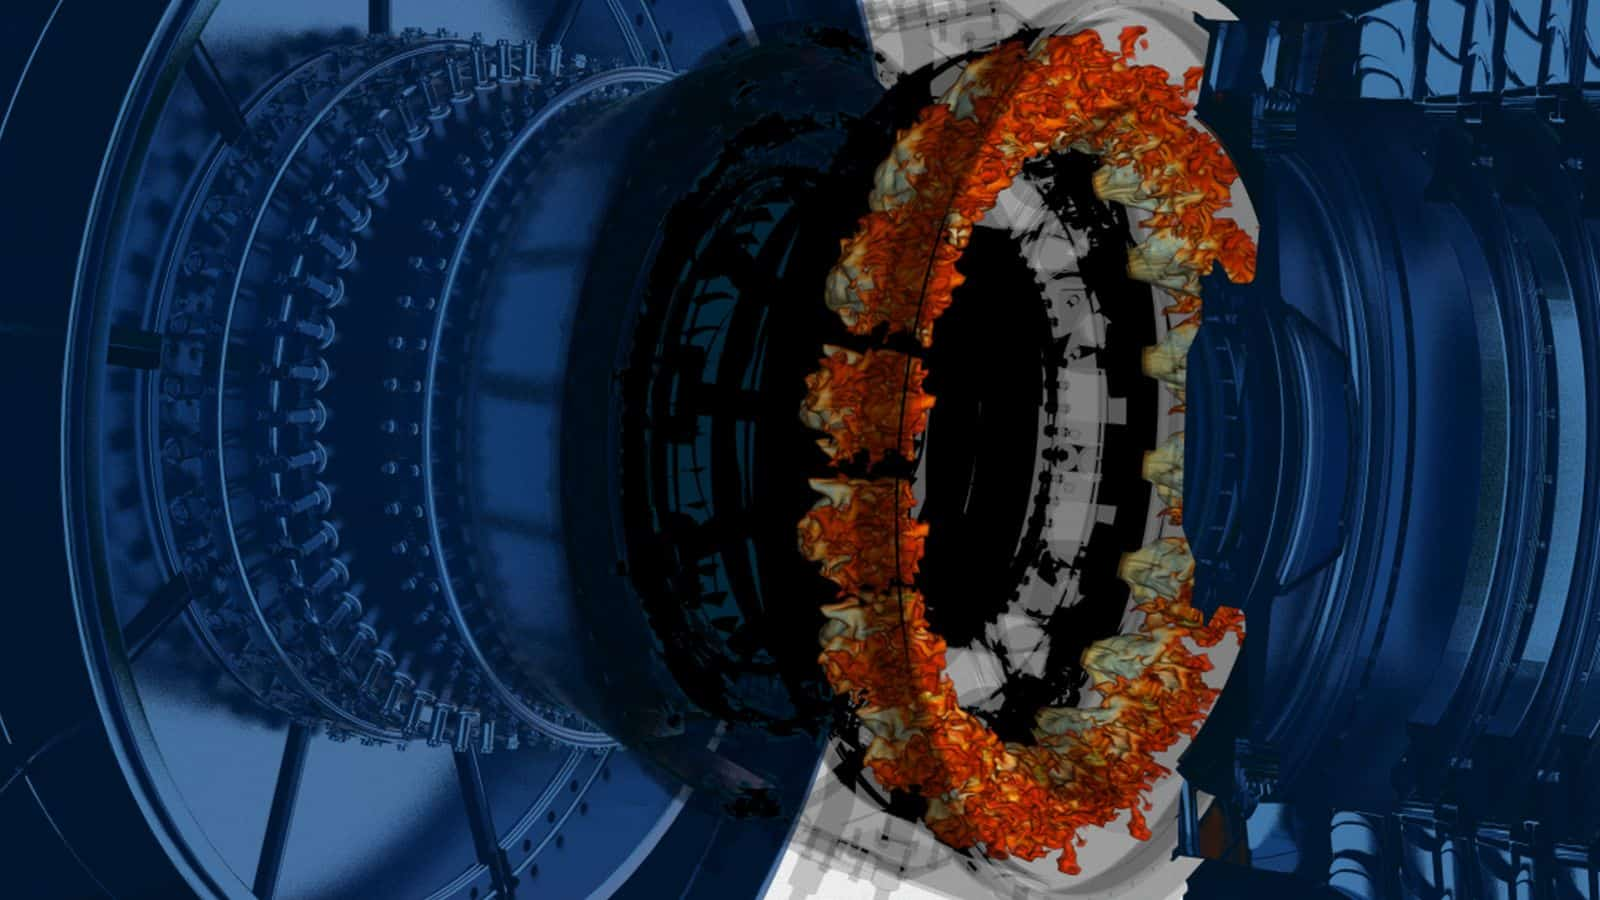 Predicting performance and improving combustor design: how B&B-AGEMA uses simulation for digital testing